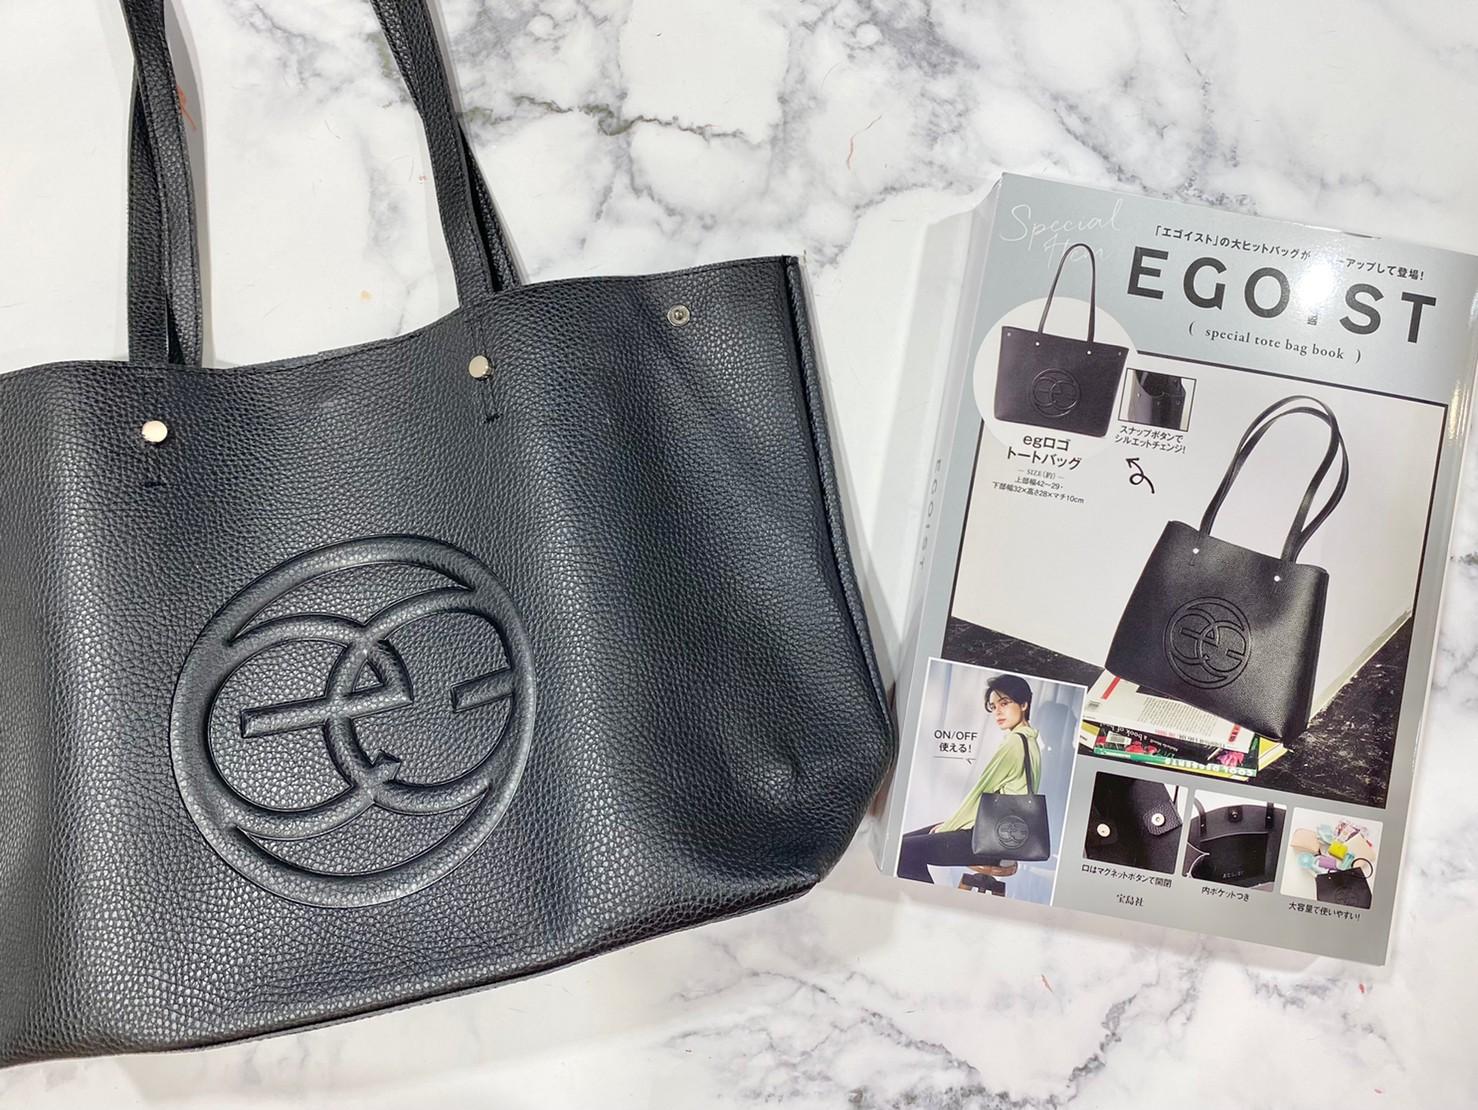 『EGOIST special tote bag book』と付録画像